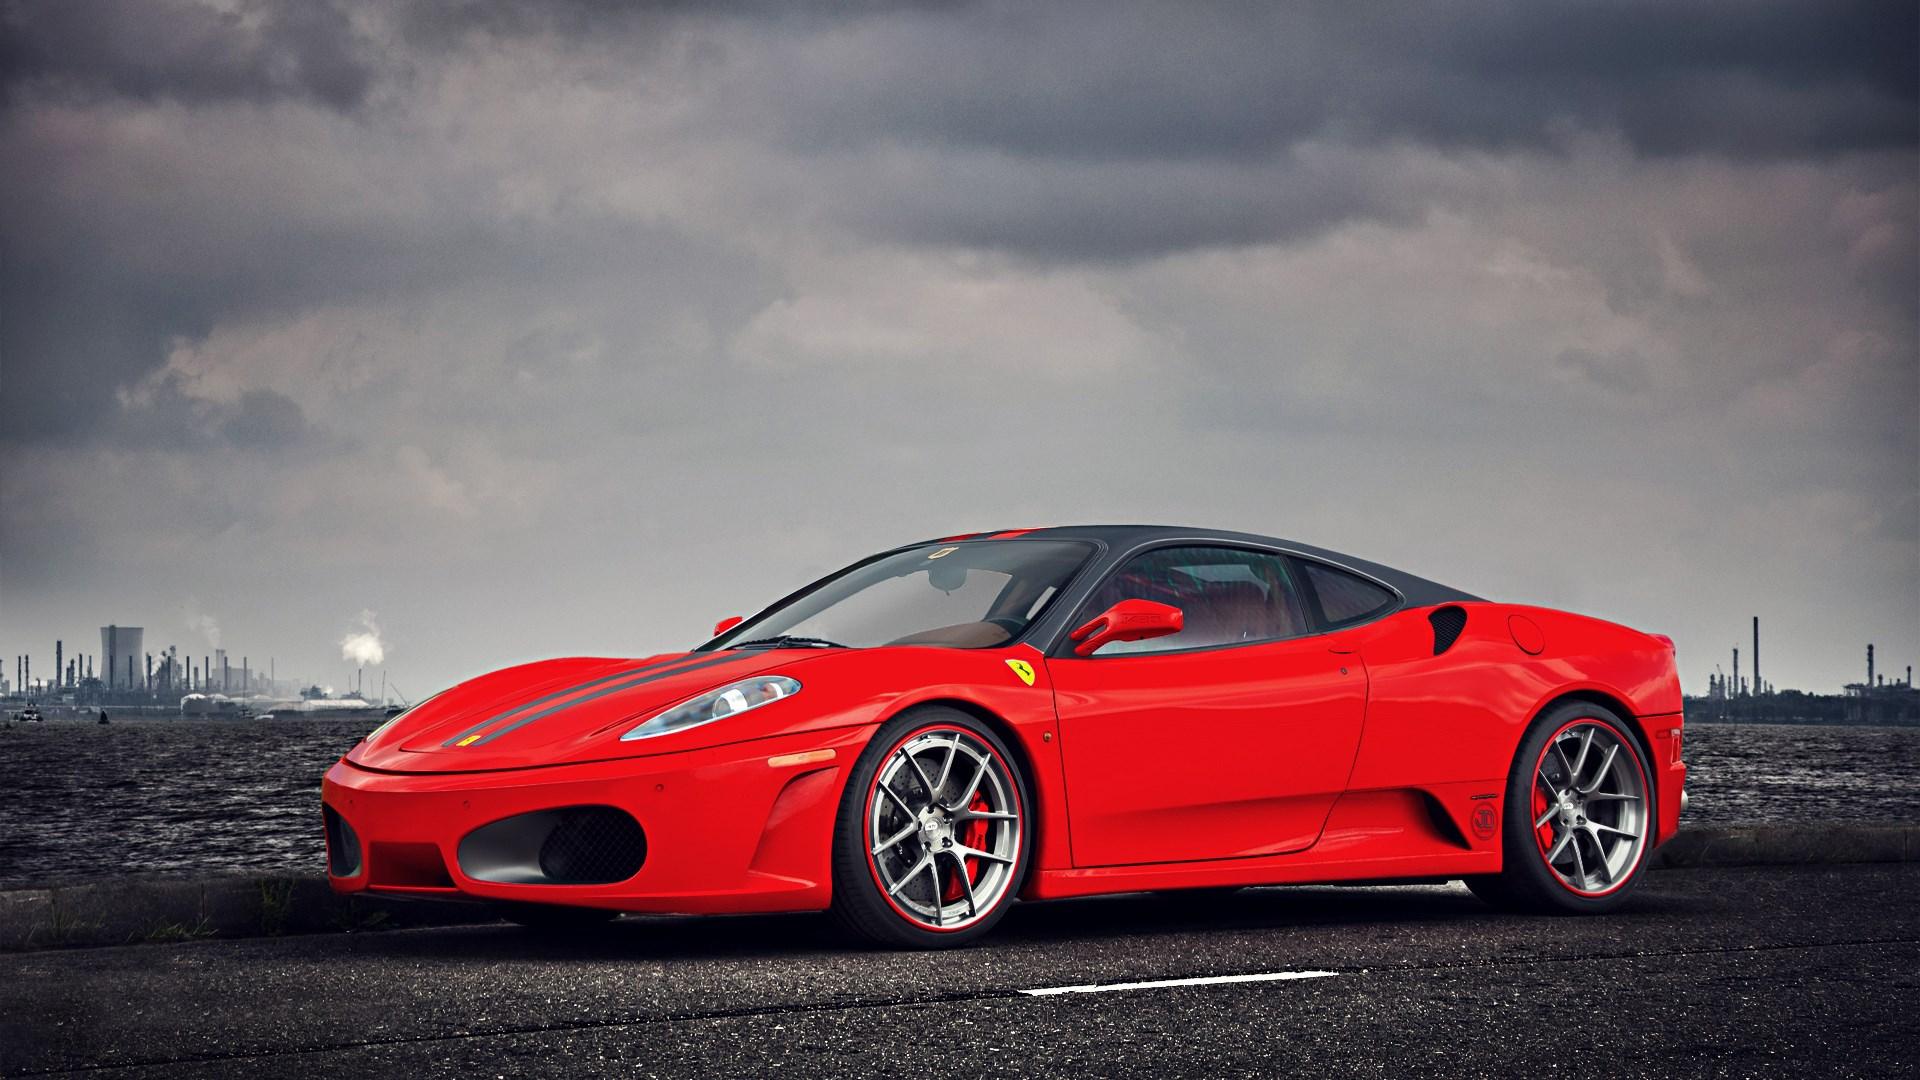 Ferrari F430 Red Parking